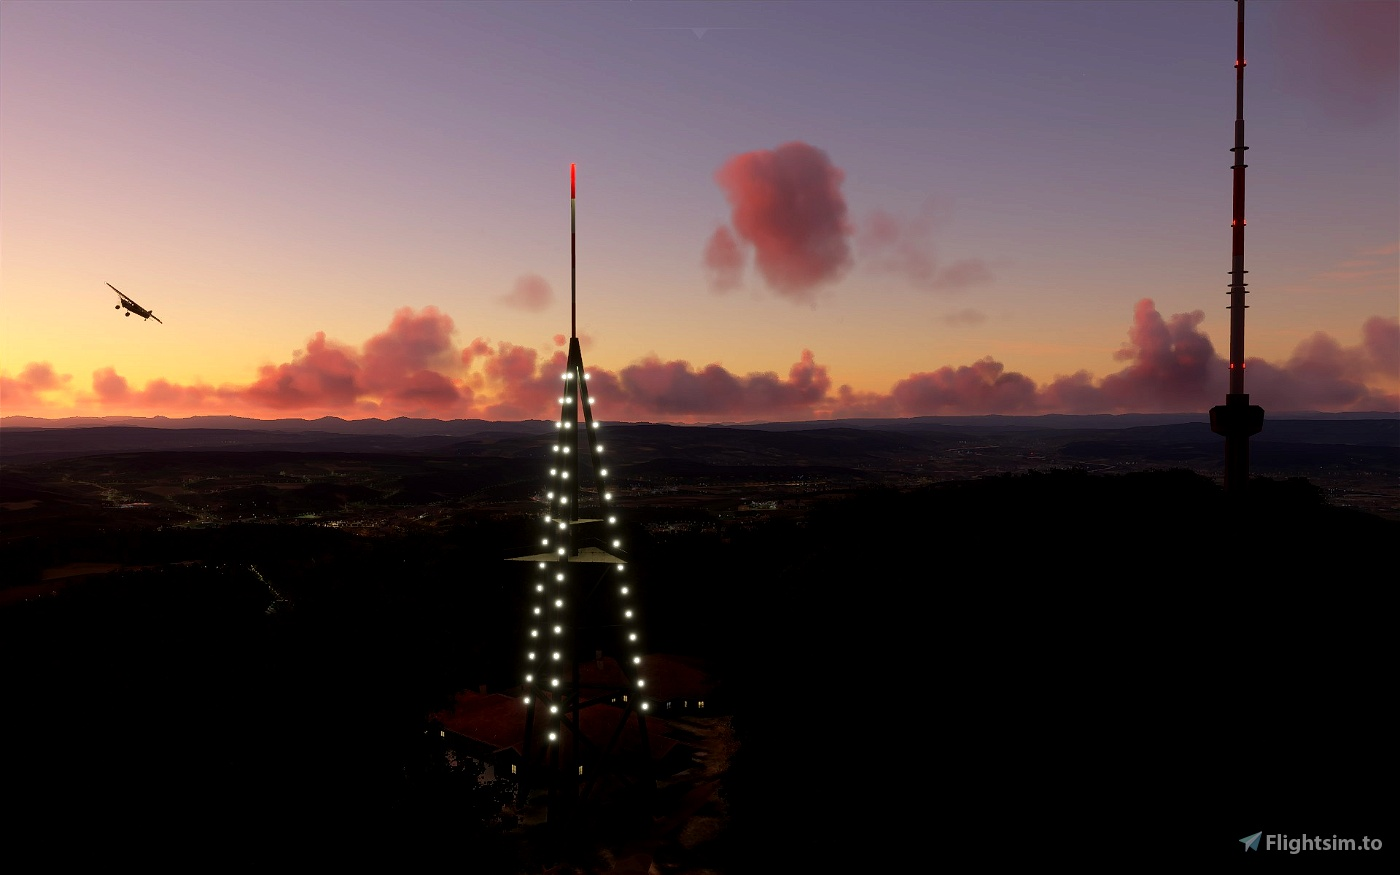 Uetliberg TV Tower and Lookout Tower Zurich/Zürich / Switzerland Image Flight Simulator 2020